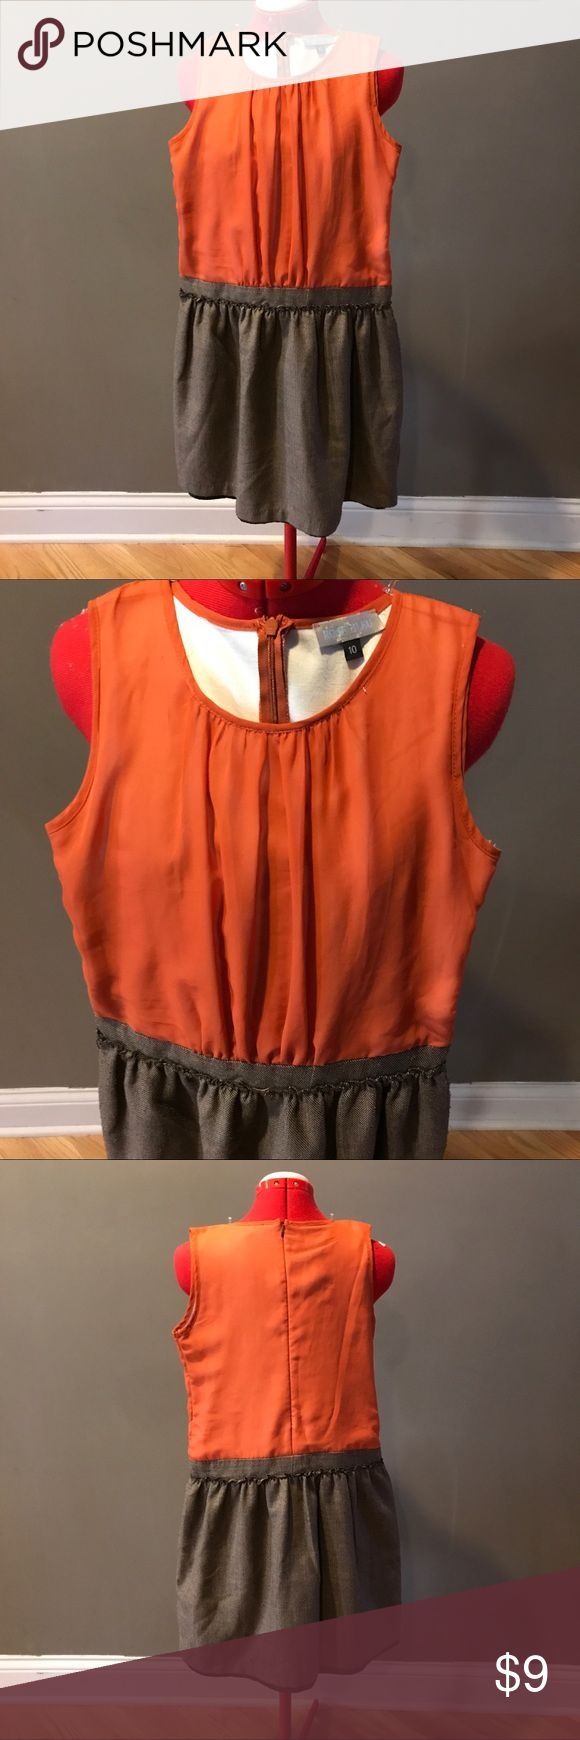 Kids Orange & Brown Mini Dress Kids Orange & Brown Mini Dress Rose Bleu  Dresses Formal